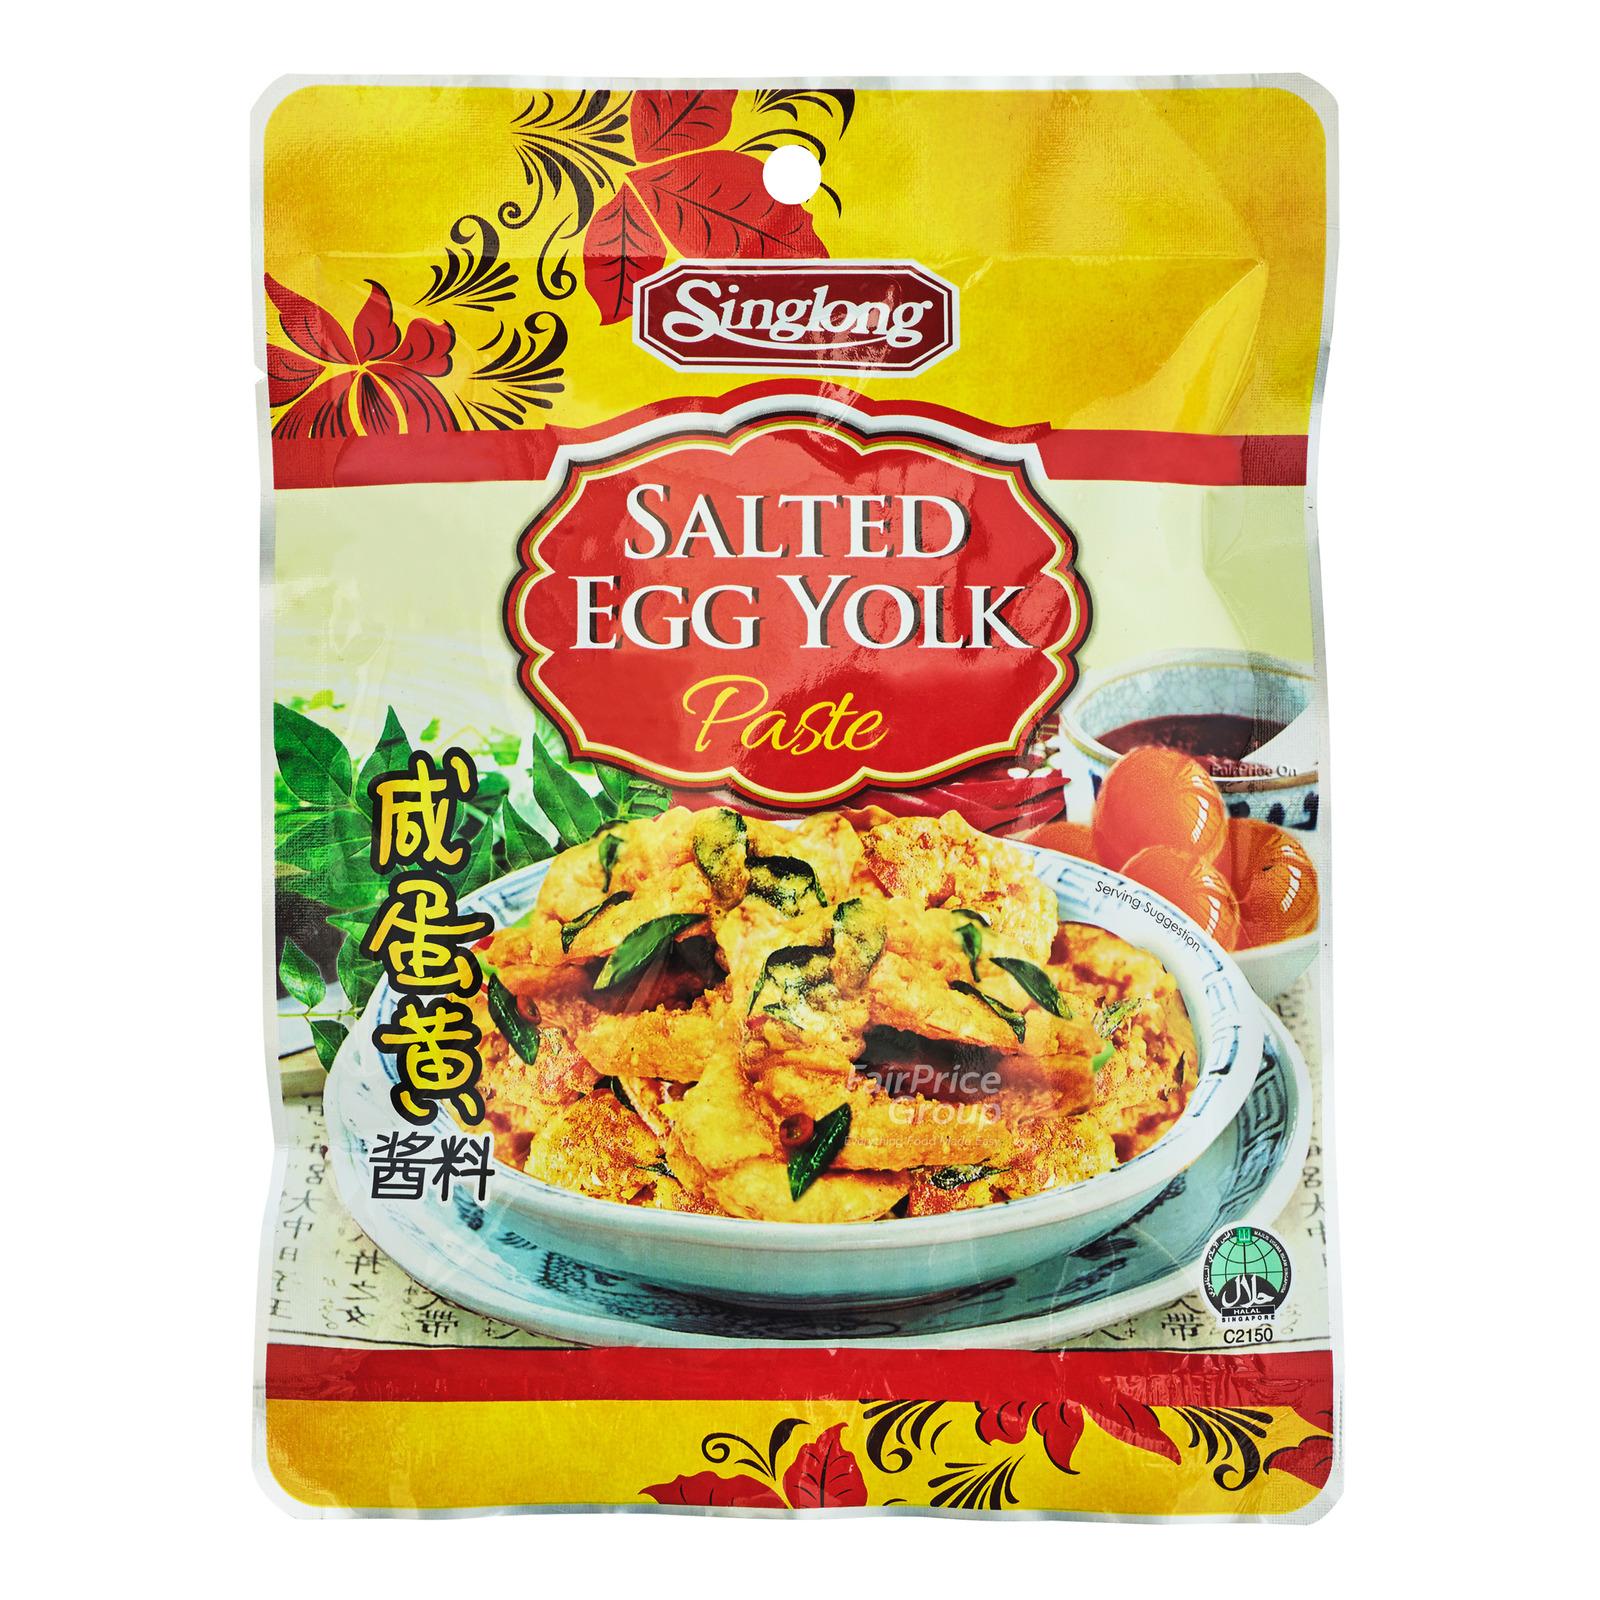 Singlong Salted Egg Yolk Paste